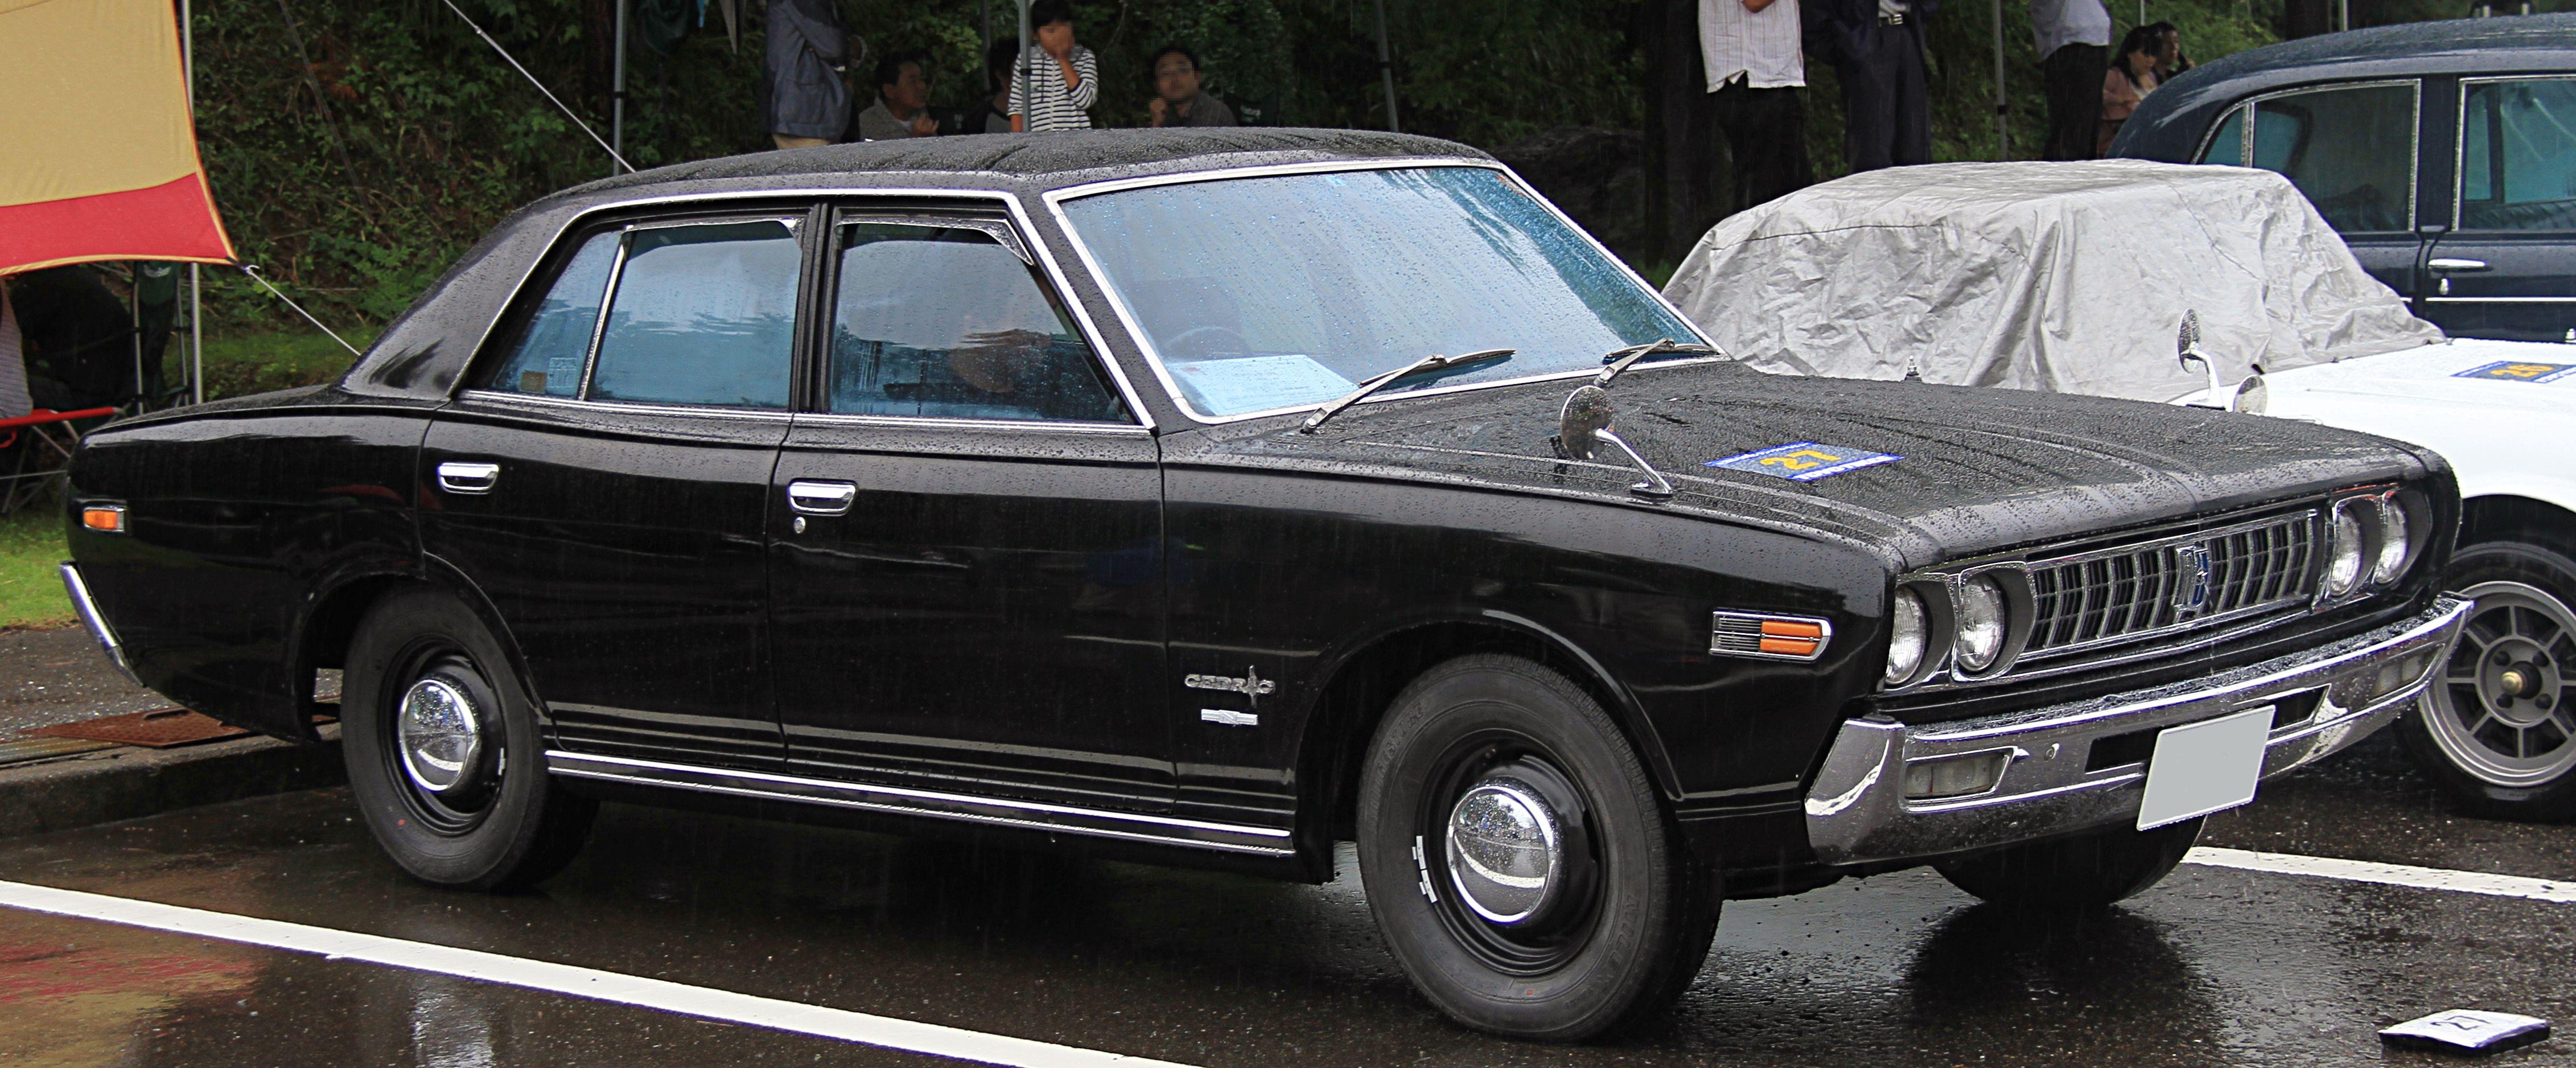 File 1971 Nissan Cedric 2000 Deluxe Jpg Wikimedia Commons